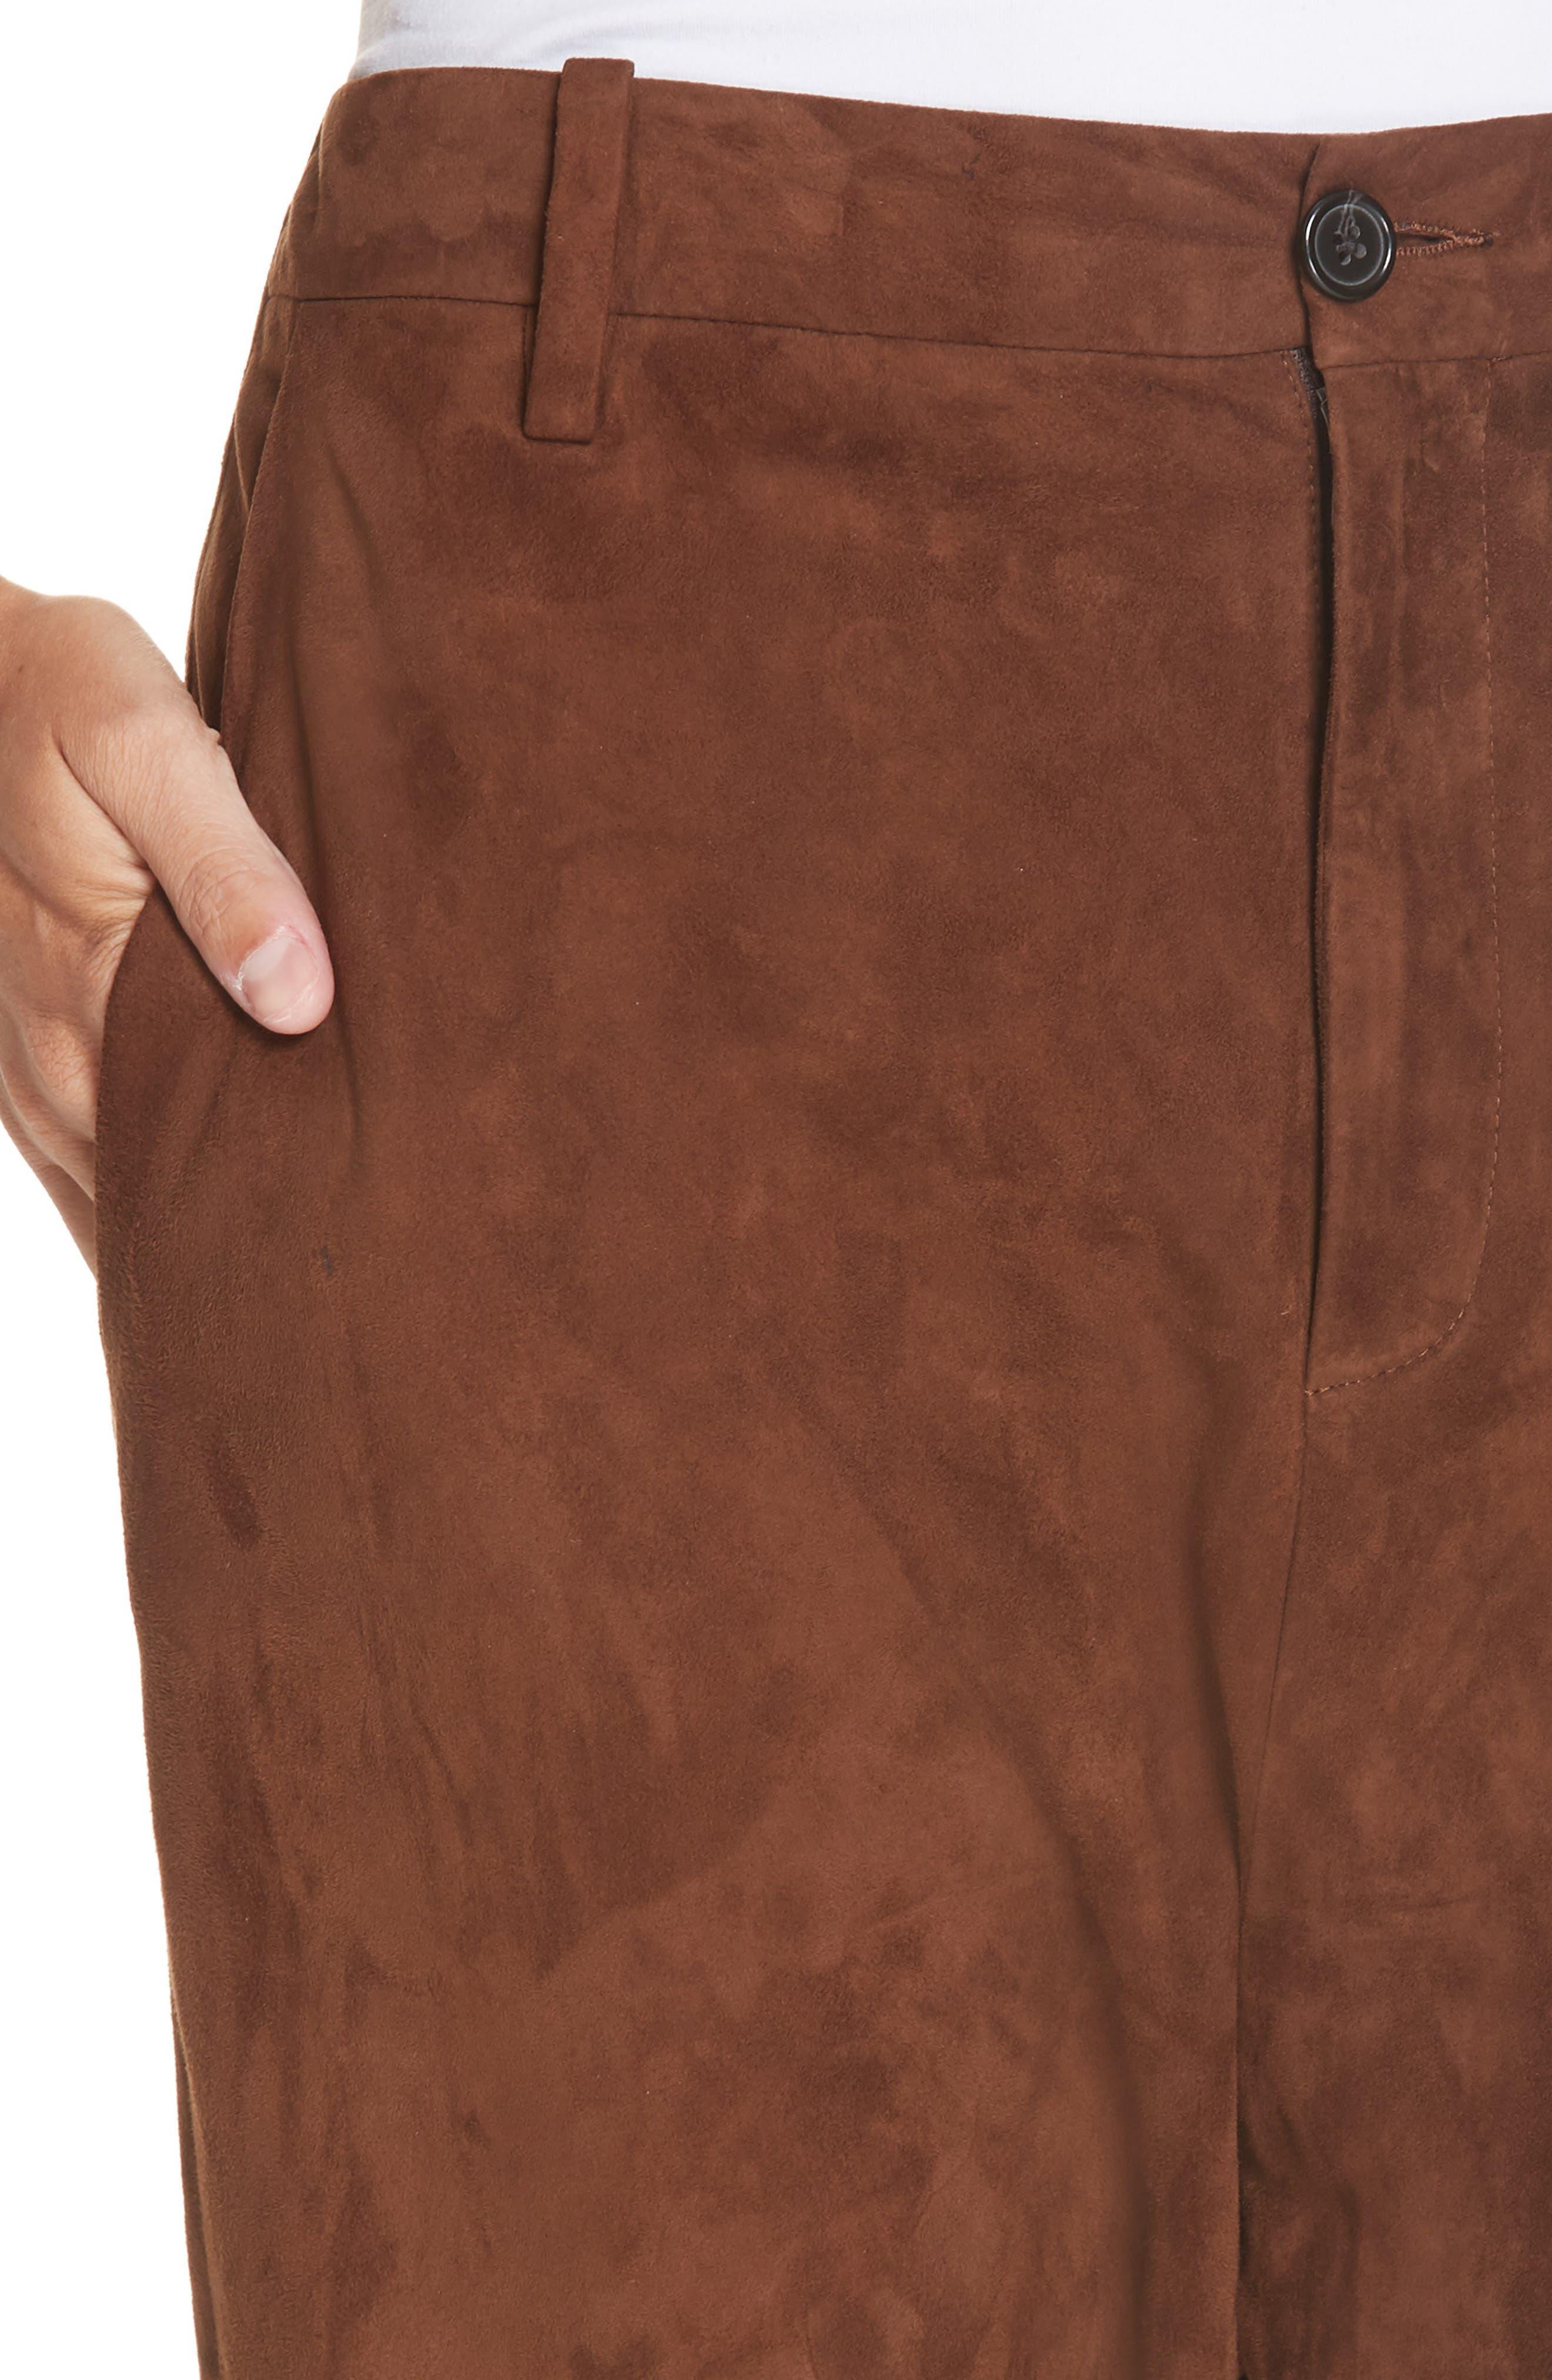 NILI LOTAN,                             Paris Leather Pants,                             Alternate thumbnail 4, color,                             DARK COGNAC